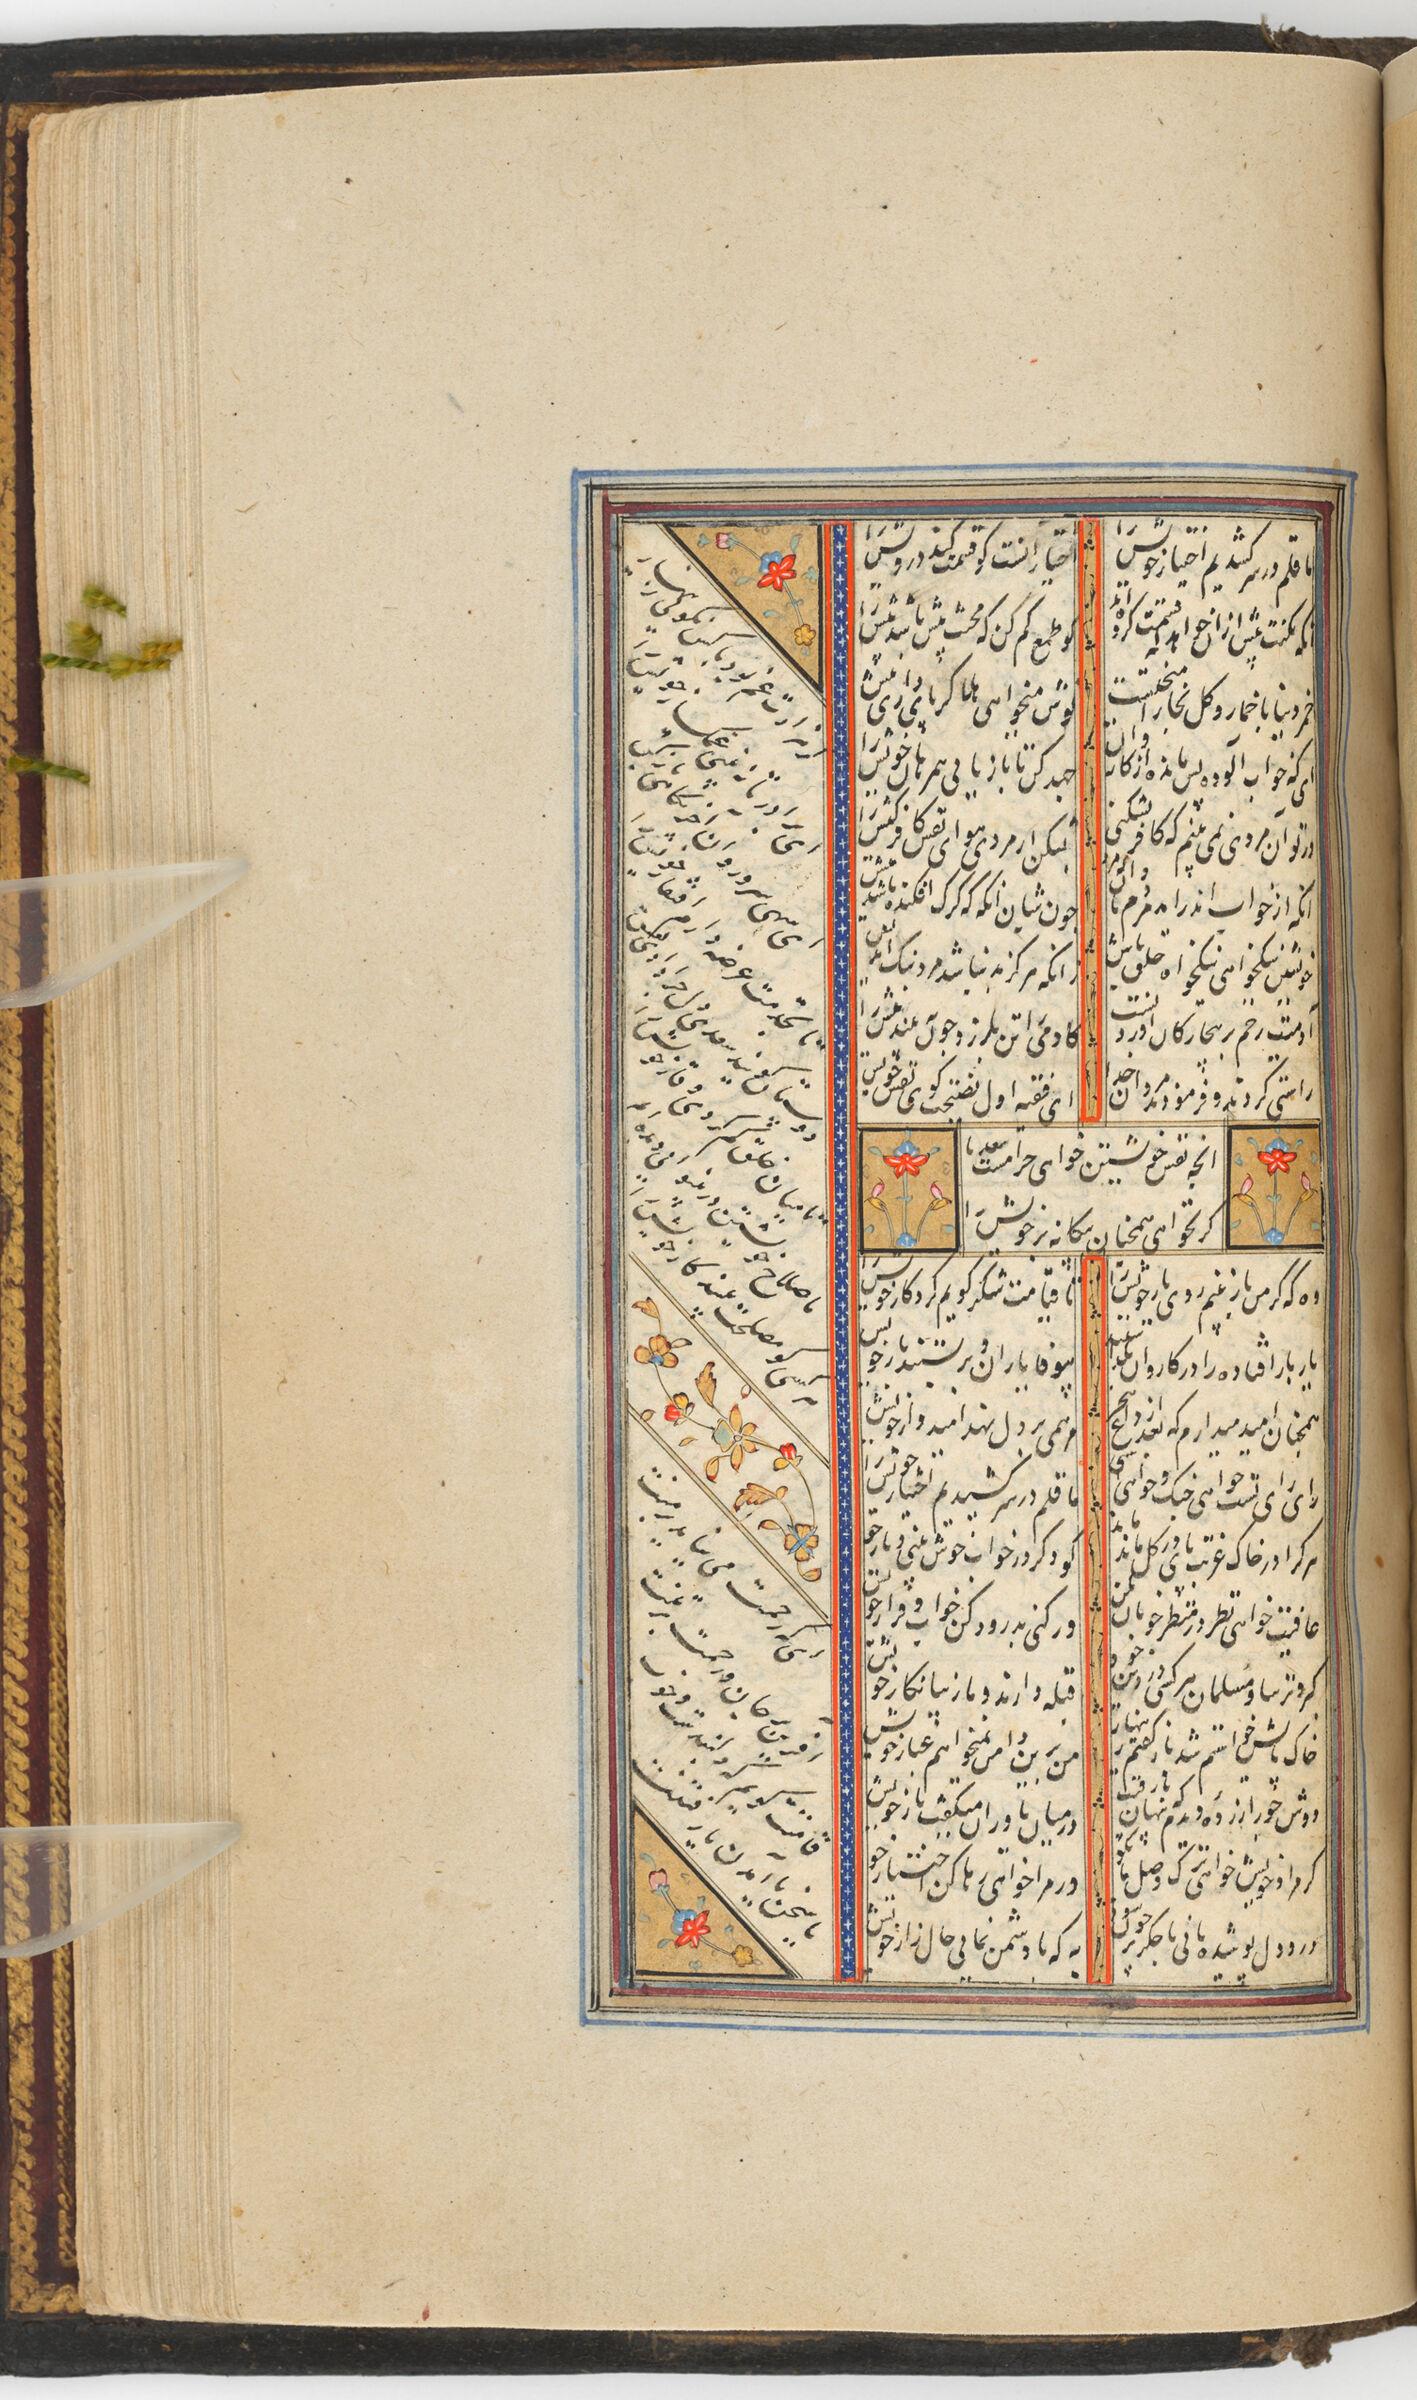 Text Folio With An Illuminated Heading (Text Folio Recto; Text Verso Of Folio 295), From A Manuscript Of The Kulliyat Of Sa'di